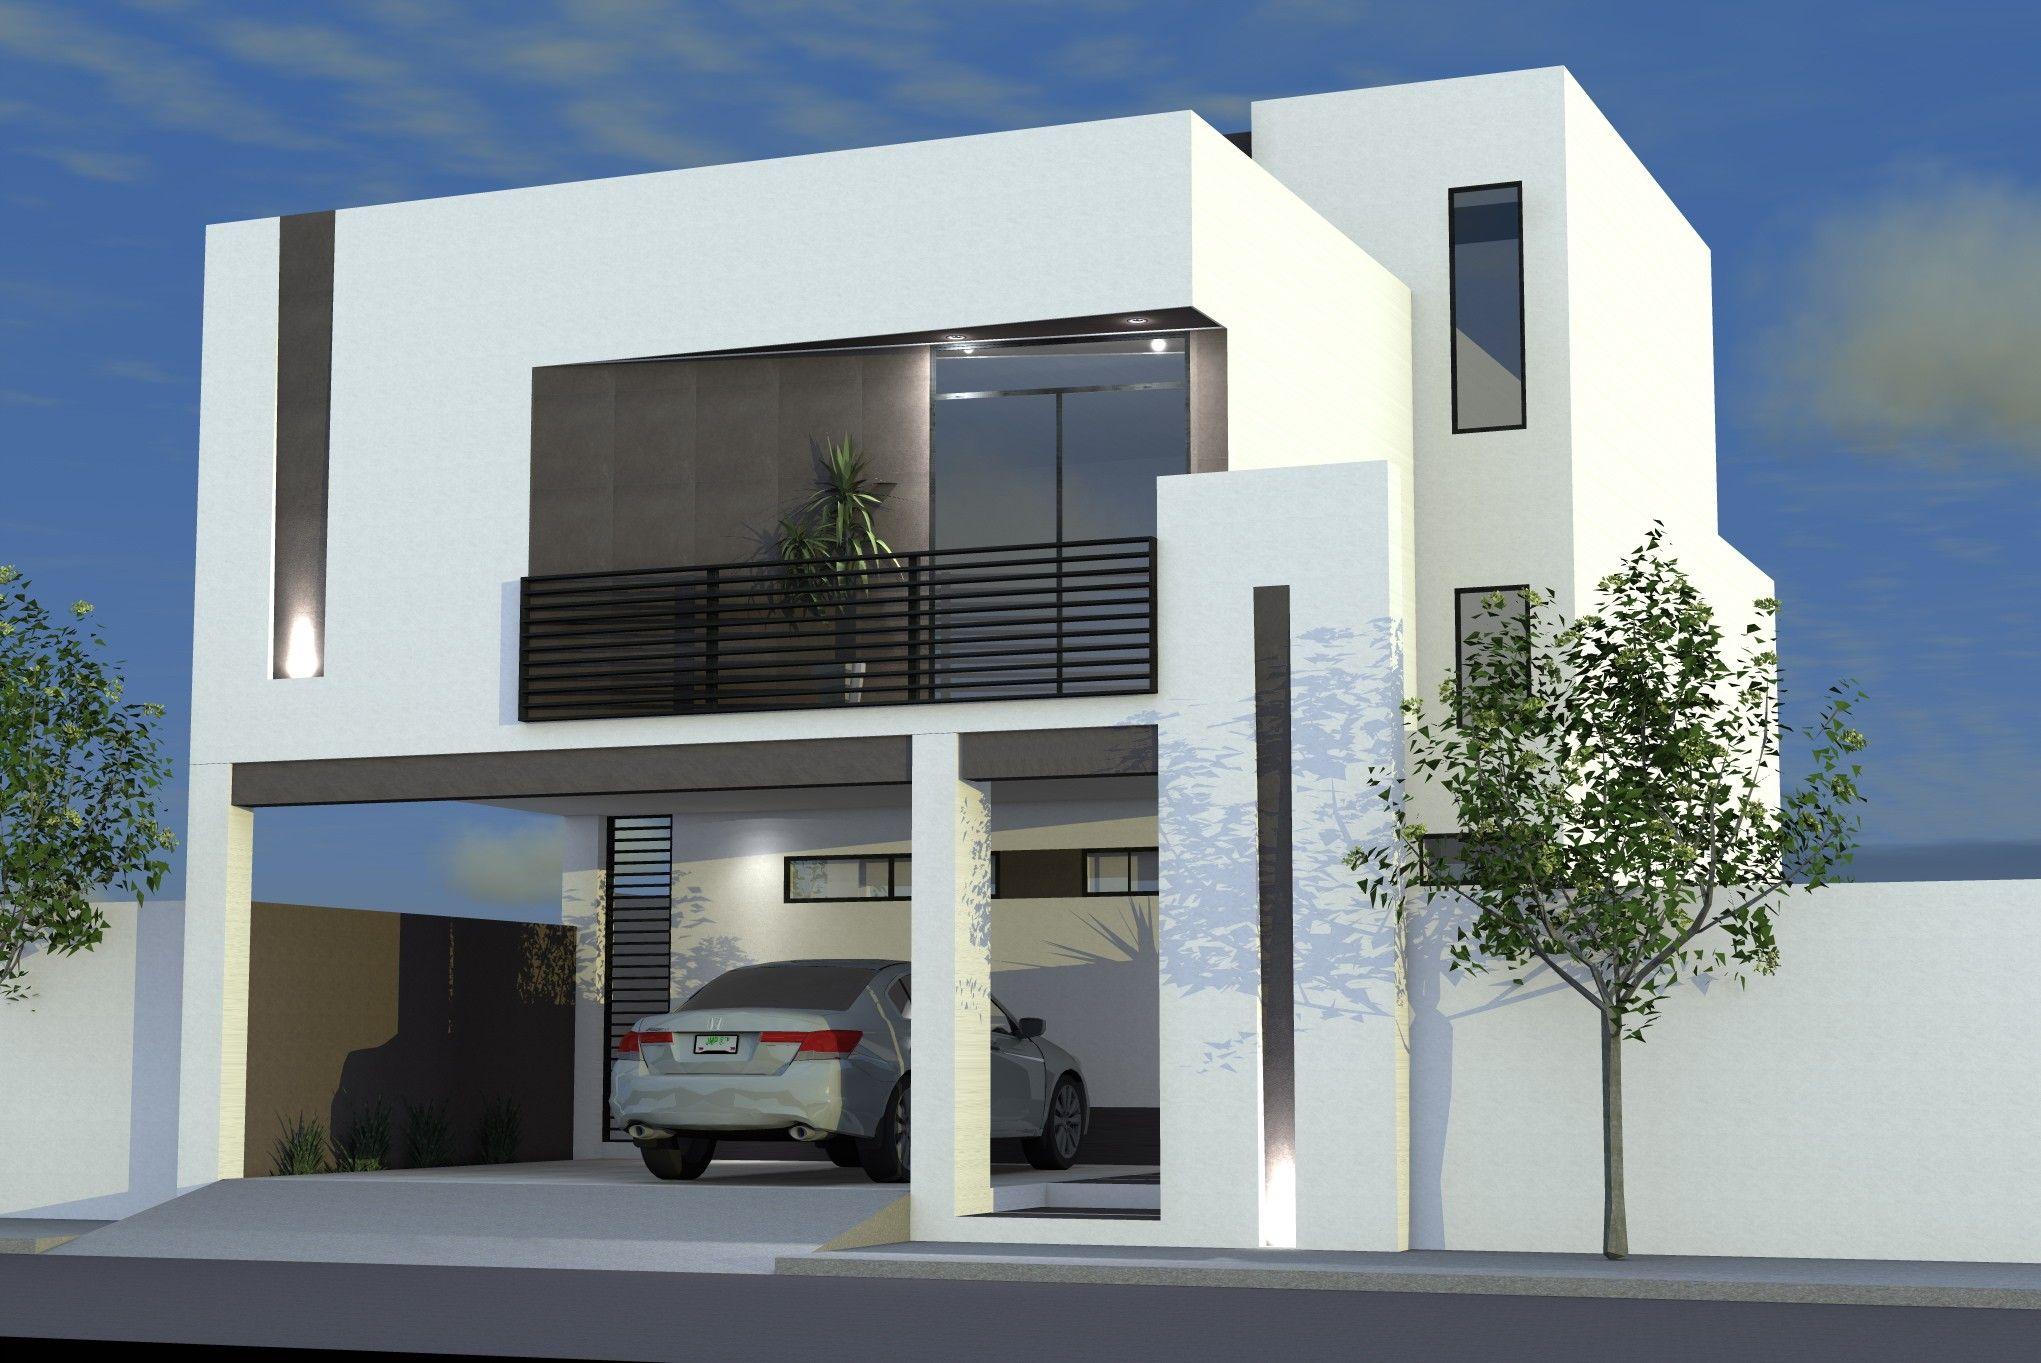 Porton herreria minimalista buscar con google fachadas for Fachadas de casas con porton